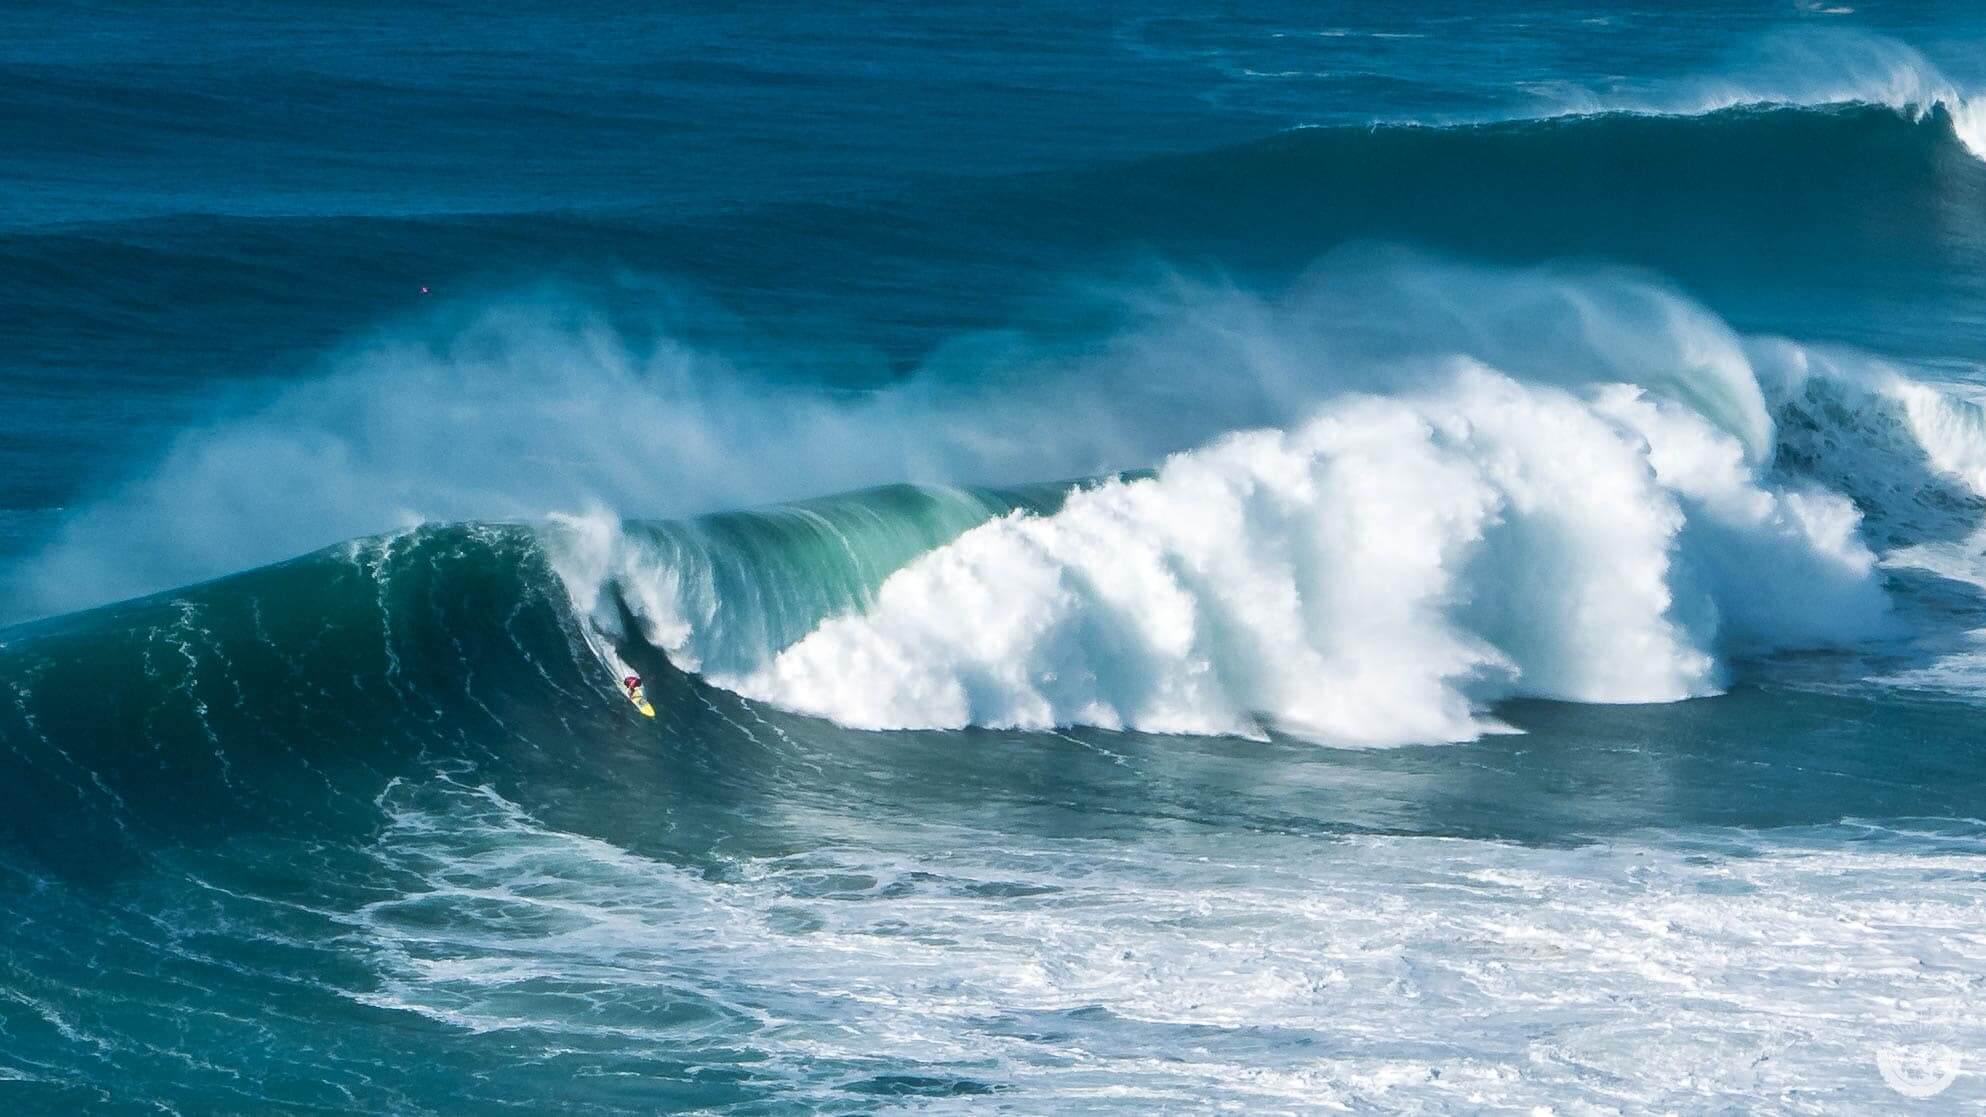 Big Wave Surf Contest in Nazaré, Portugal